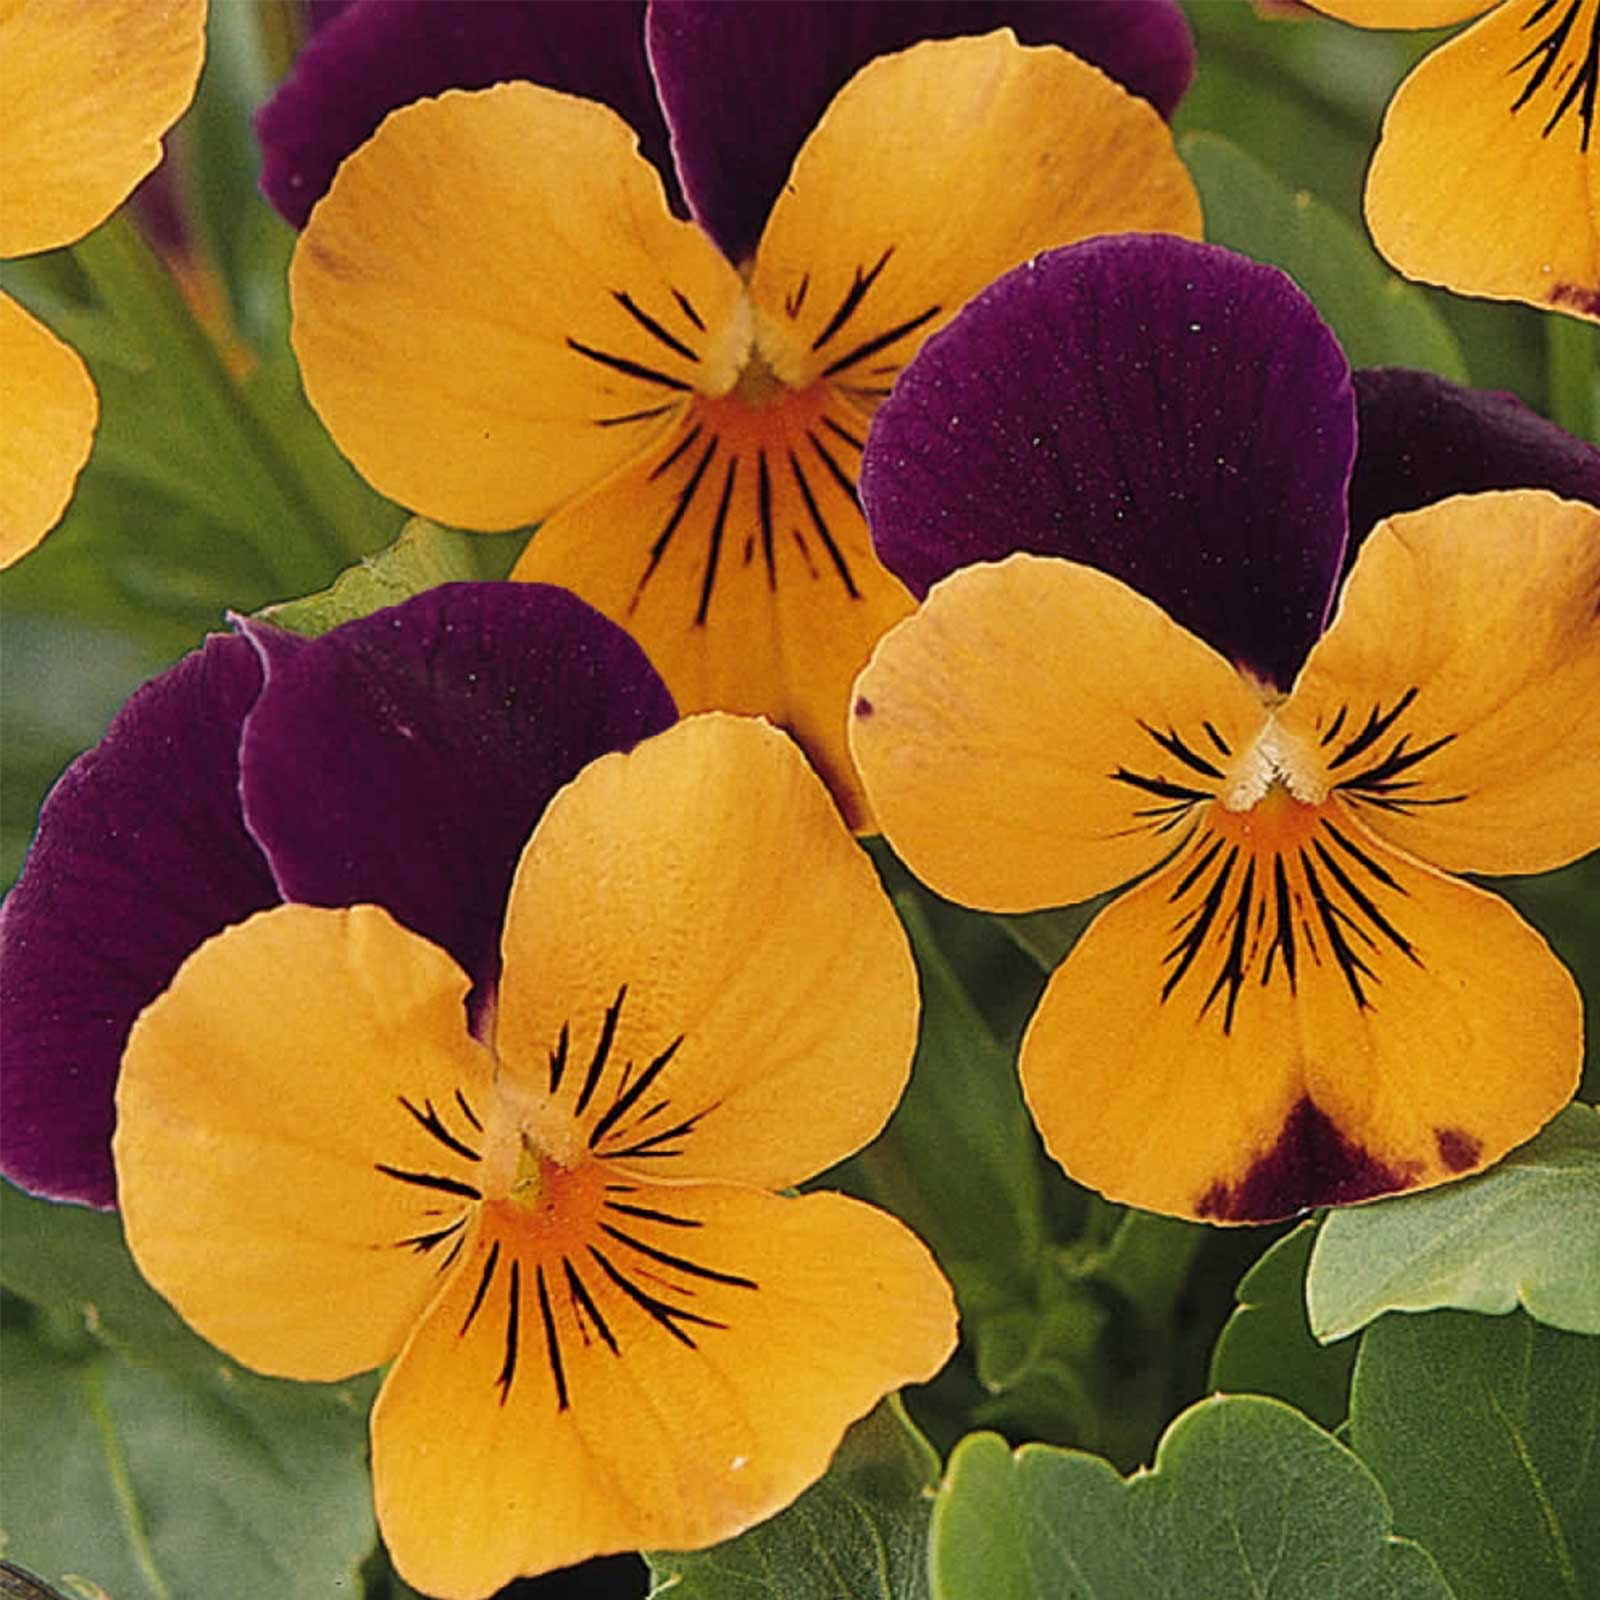 Viola Flower Garden Seeds - Sorbet F1 Series - Mix - 100 Seeds - Annual Flower Gardening Seeds